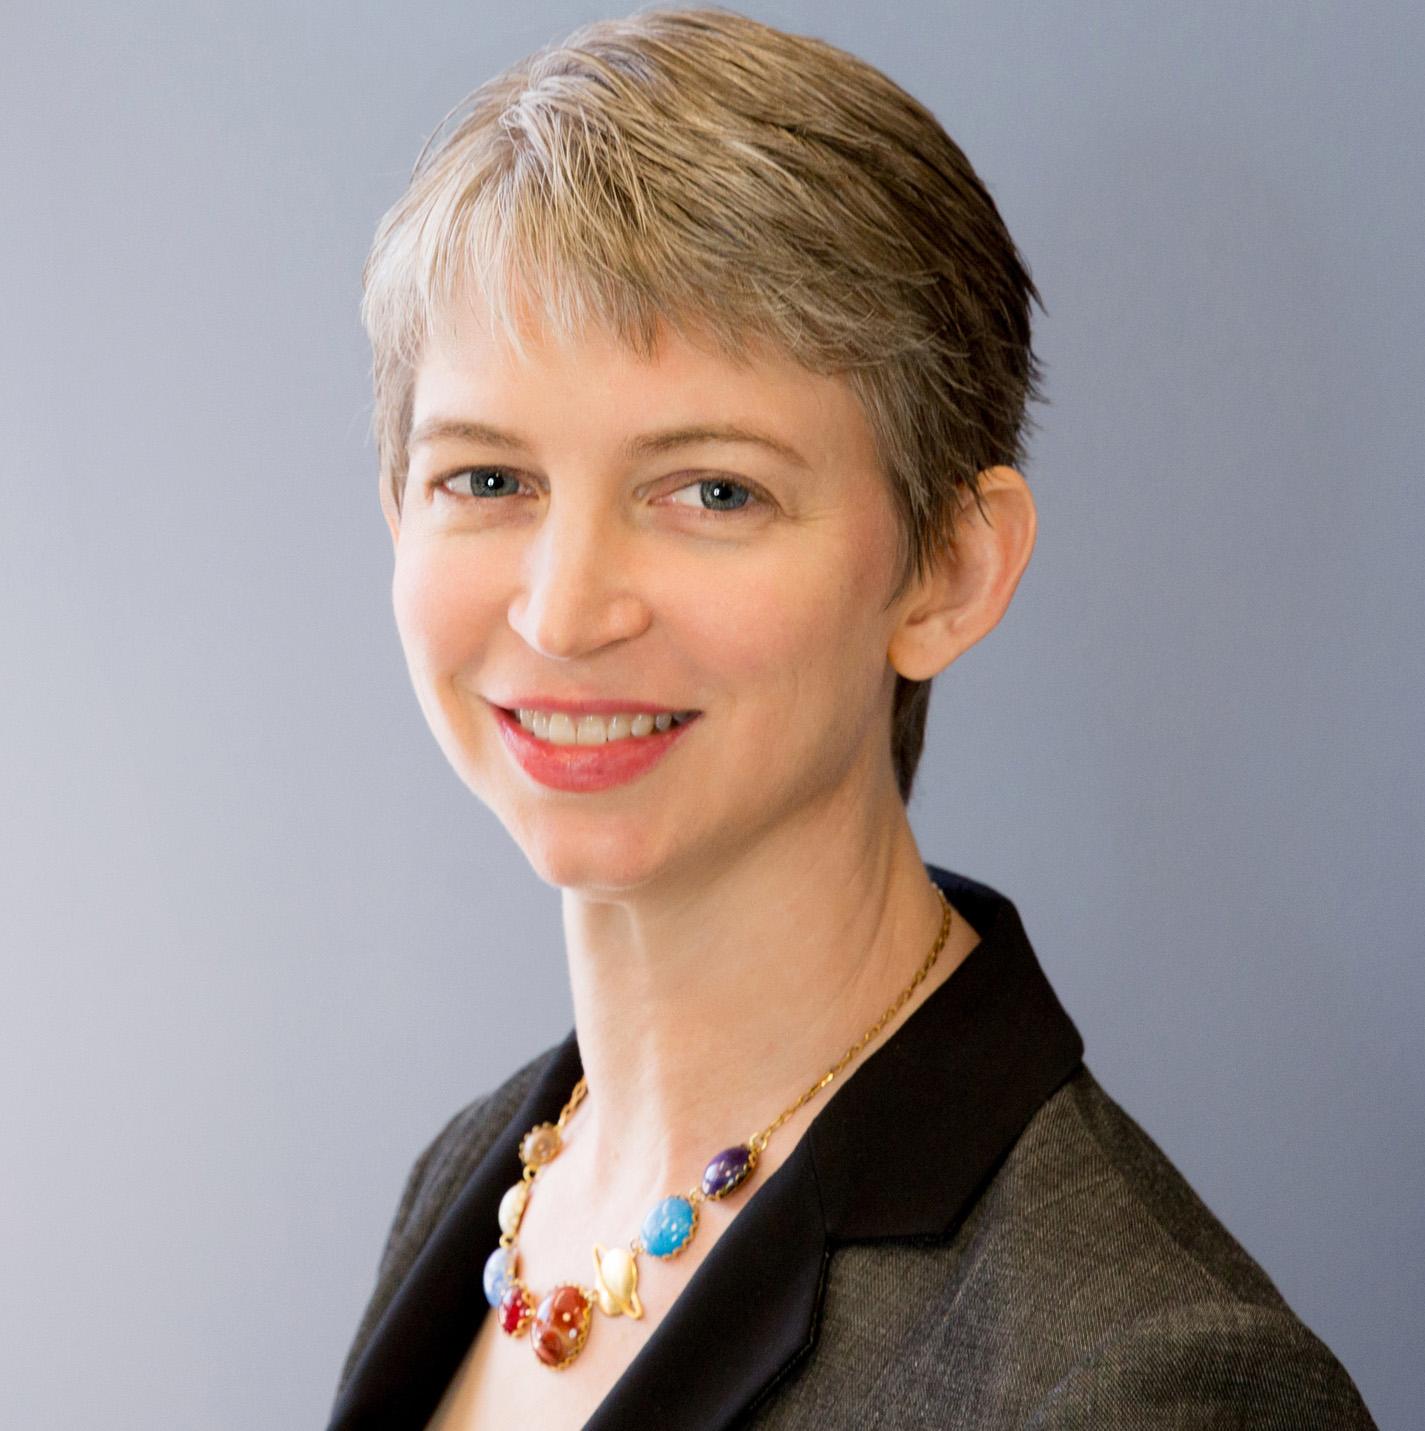 Emily Lakdawalla